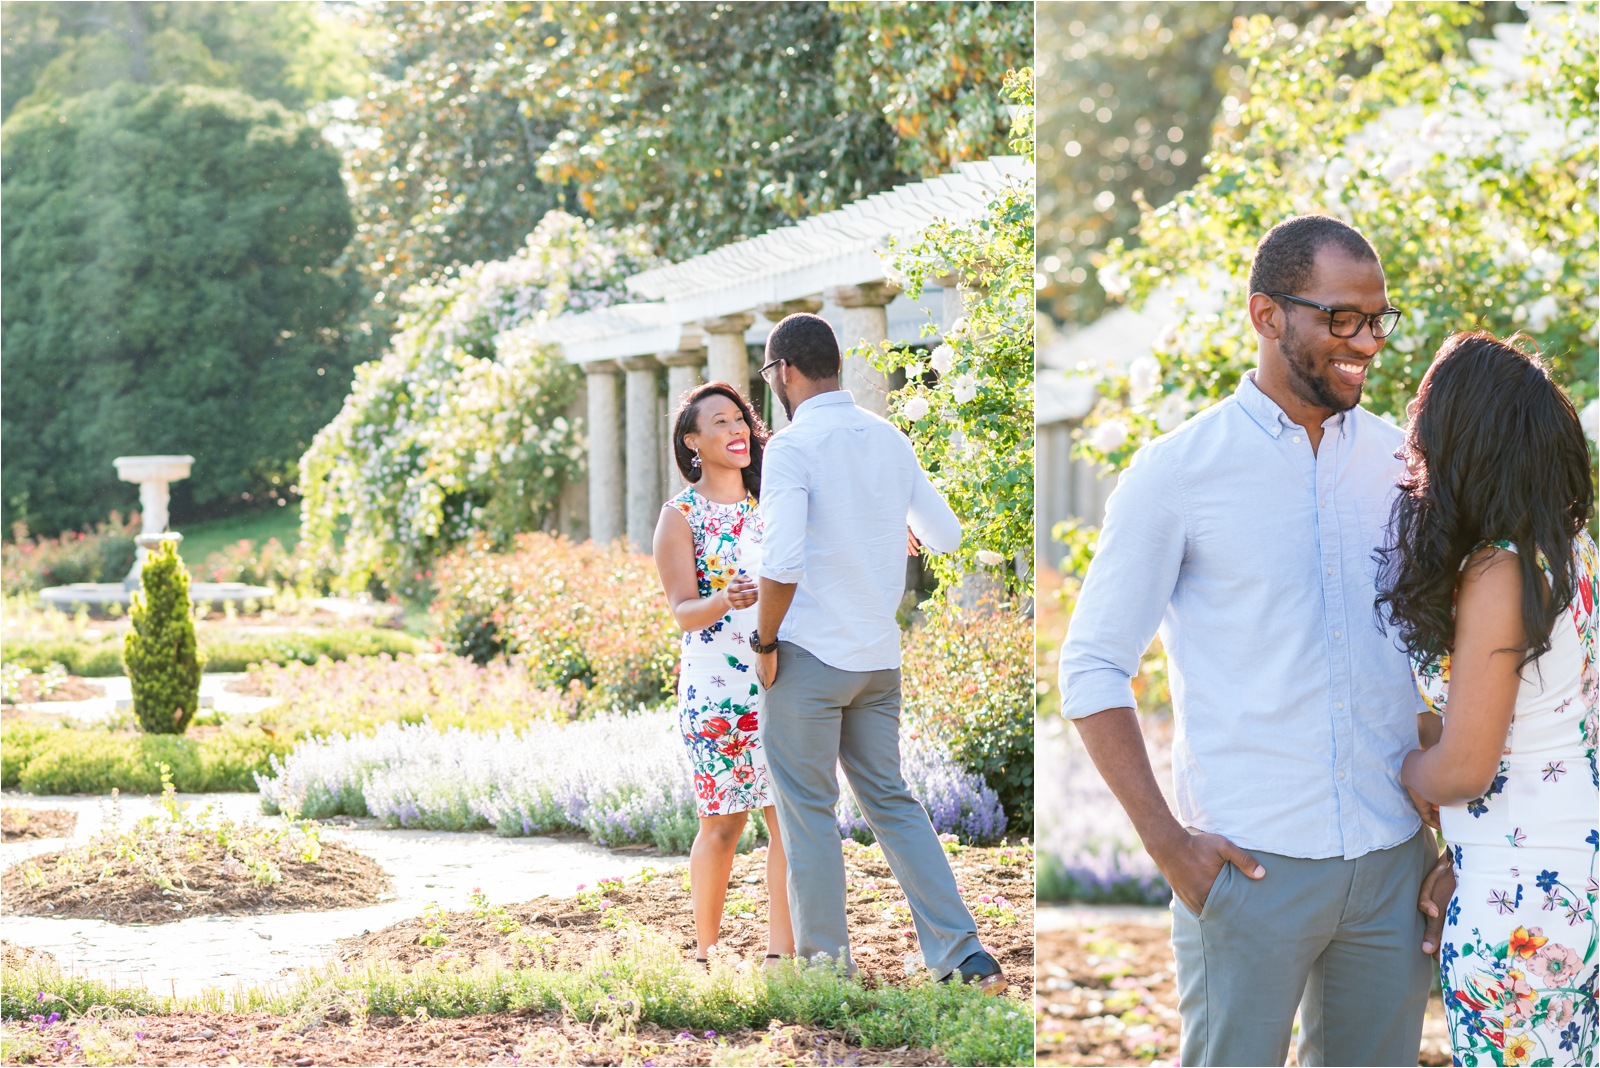 italian-gardens-engagement-images-maymont-park-italian-japanese-gardens-richmond-virginia-rva-va-focus-on-joy-photography-african-american-couple-white-dress-colorful-flowers-blue-polo-shirt-richmond